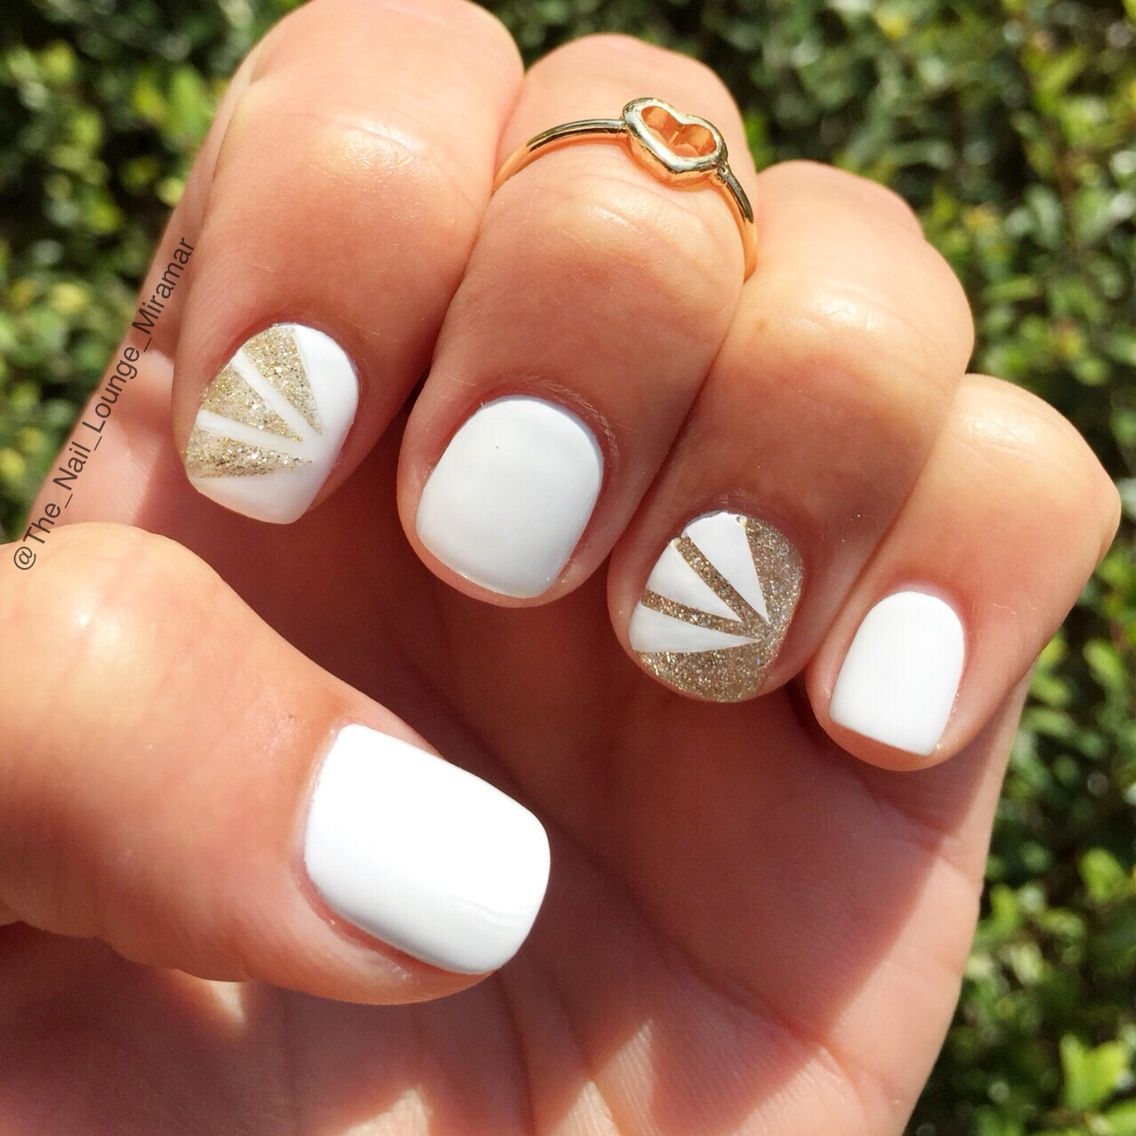 Bridal Nails Inspiration - Romantic Glitter Gradient Nail